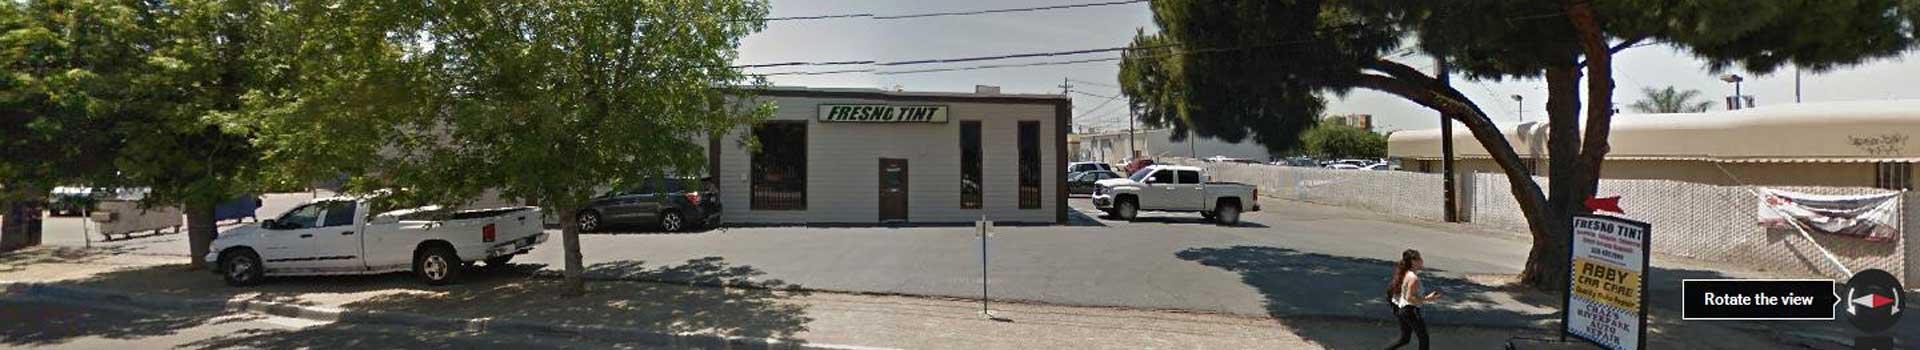 Fresno Tint Building